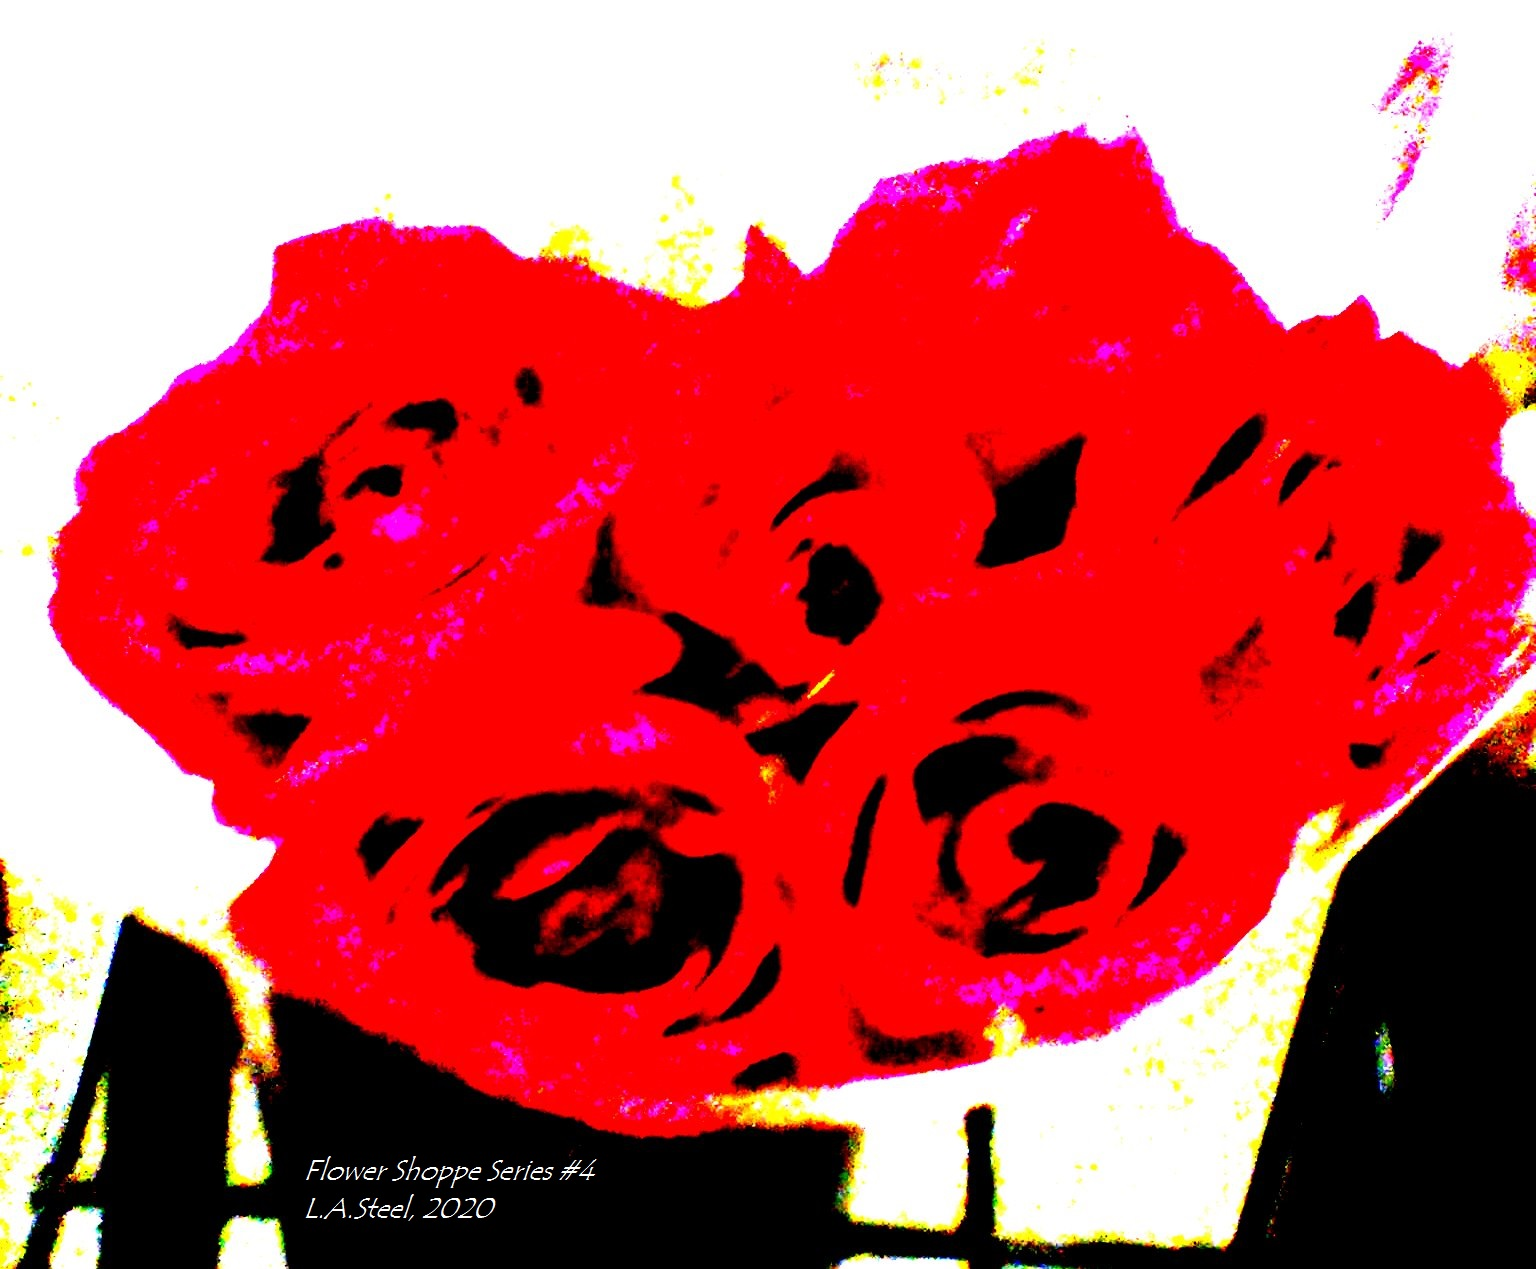 flower shoppe series 4#17 2020